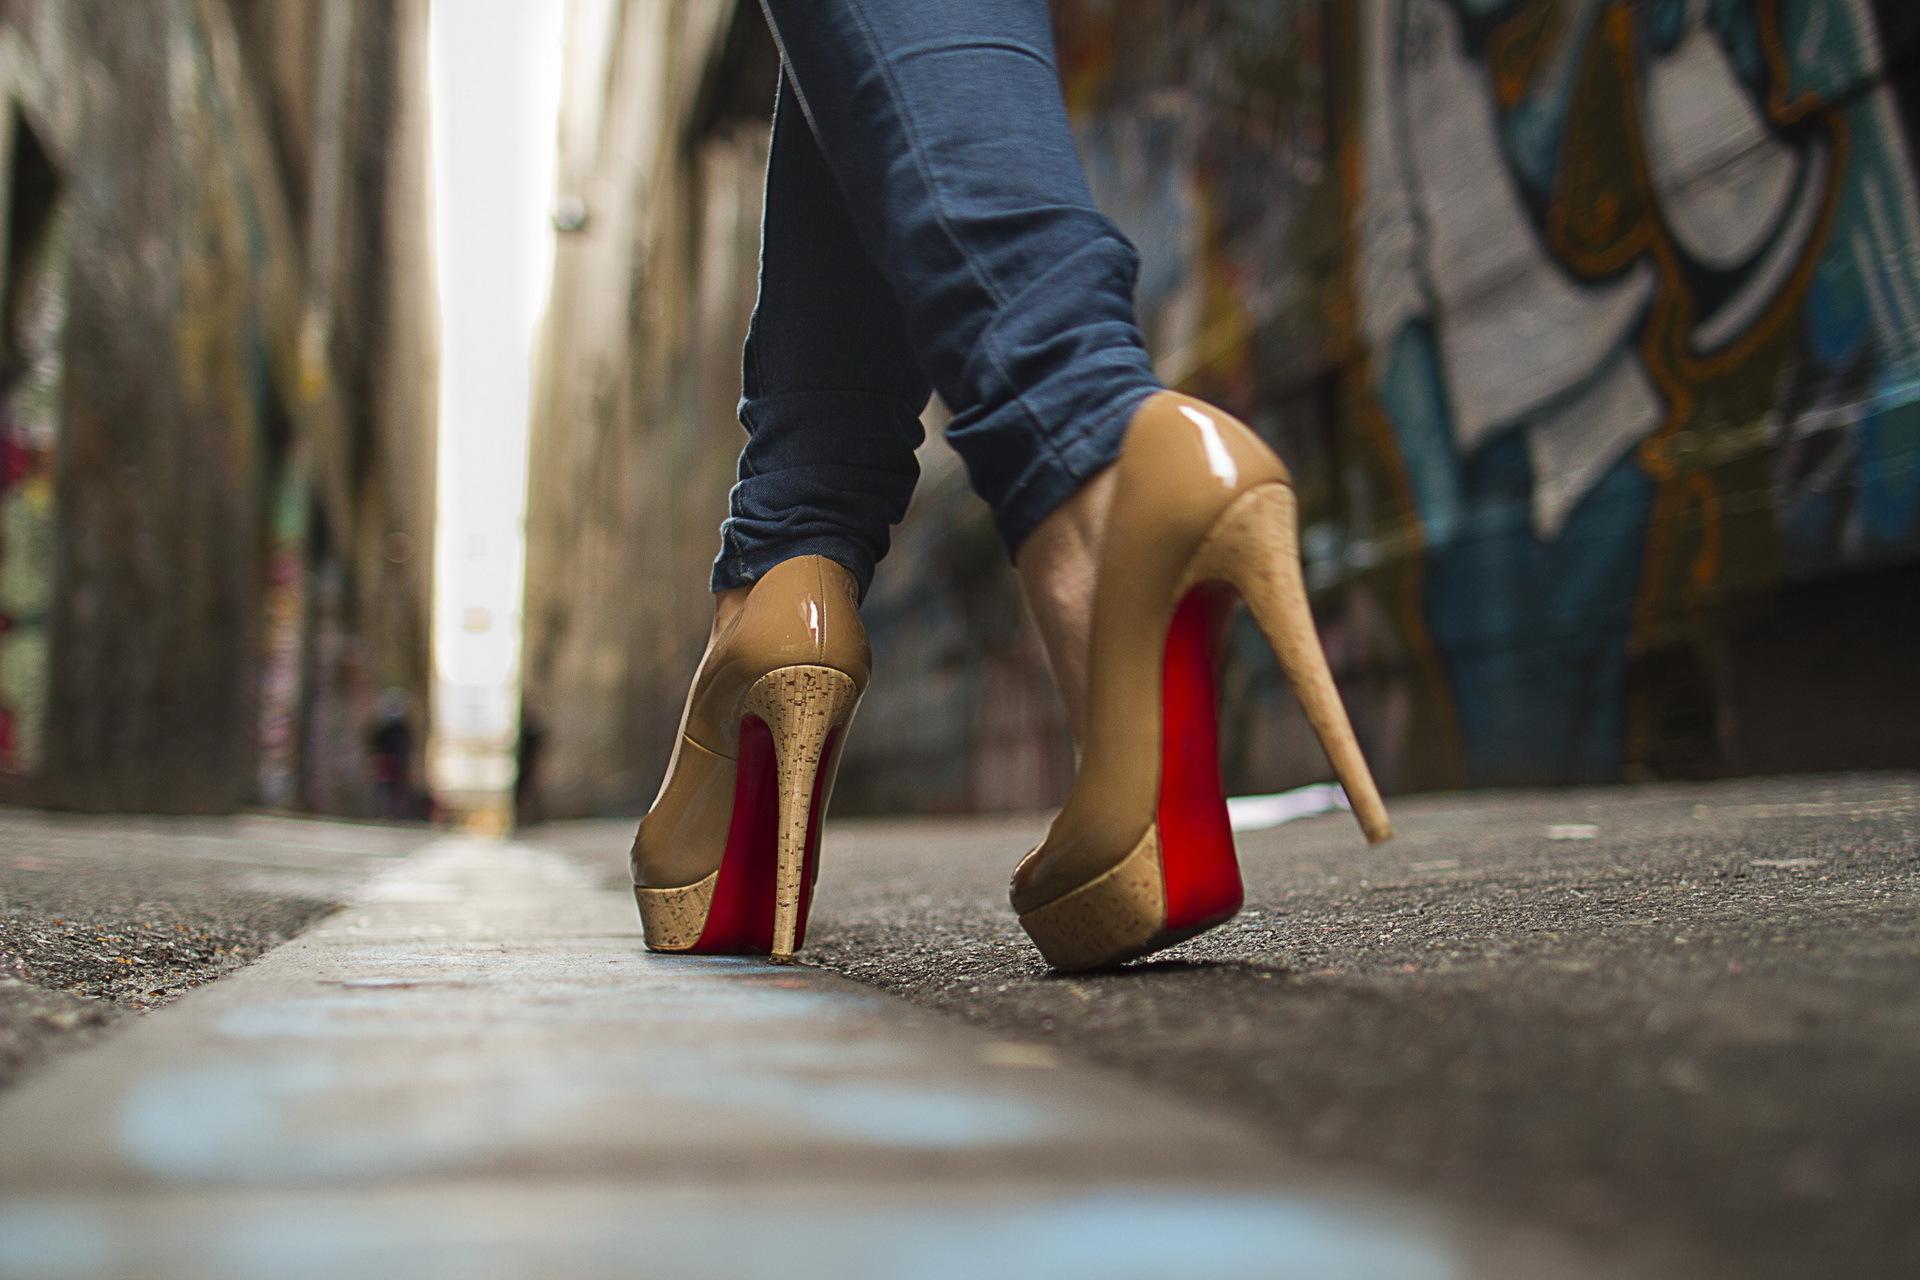 Фото на тему: Как ходить на каблуках без забот